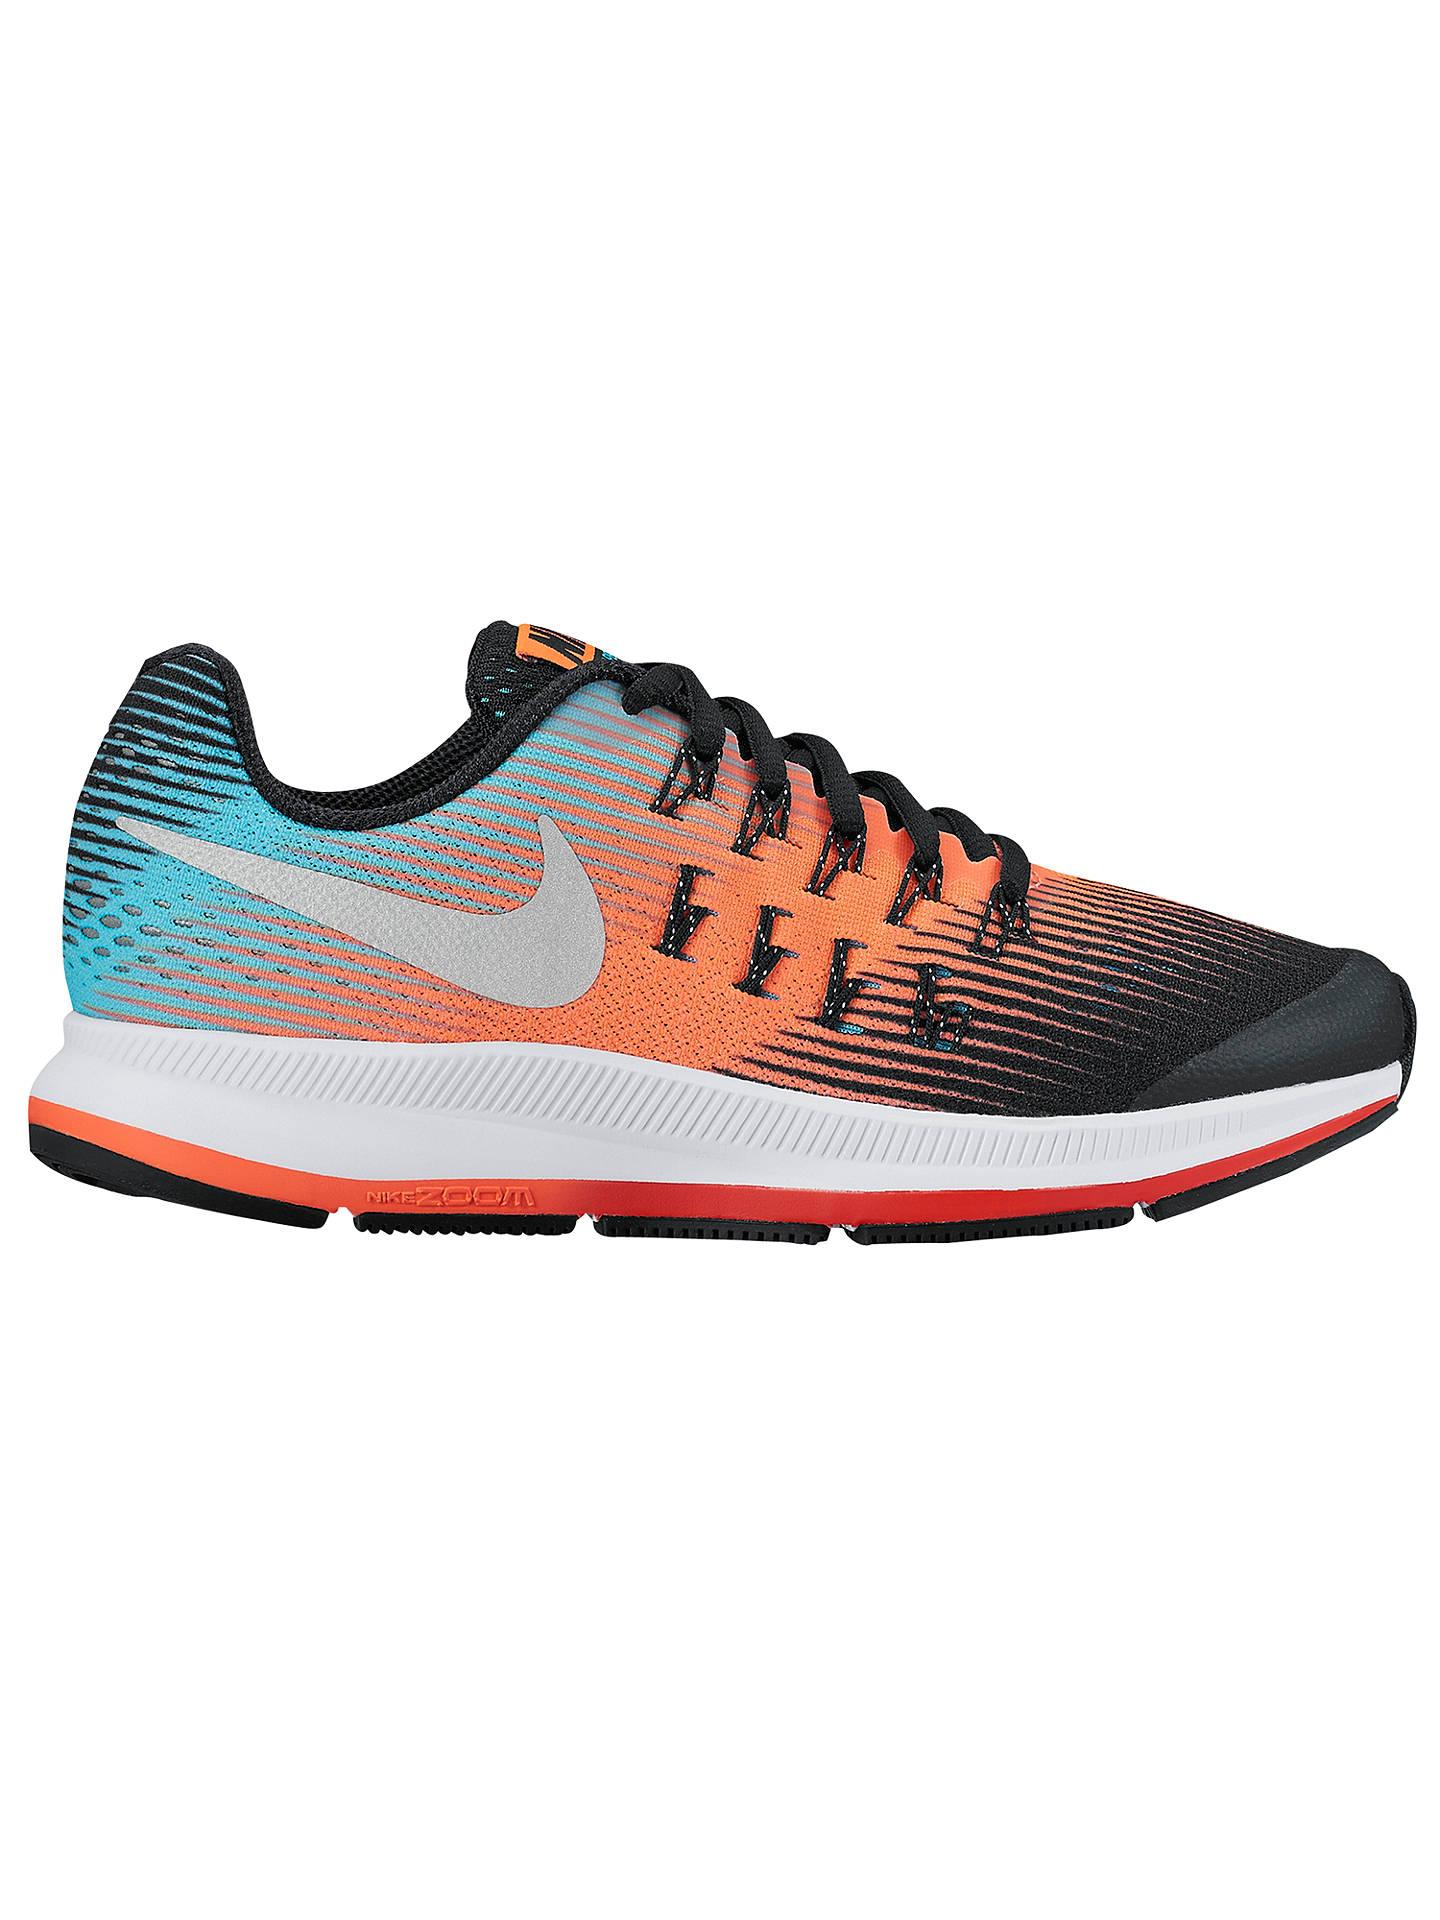 timeless design 3e16b 19acc Buy Nike Children s Air Zoom Pegasus 33 Running Shoes, Black Orange, 3  Online ...